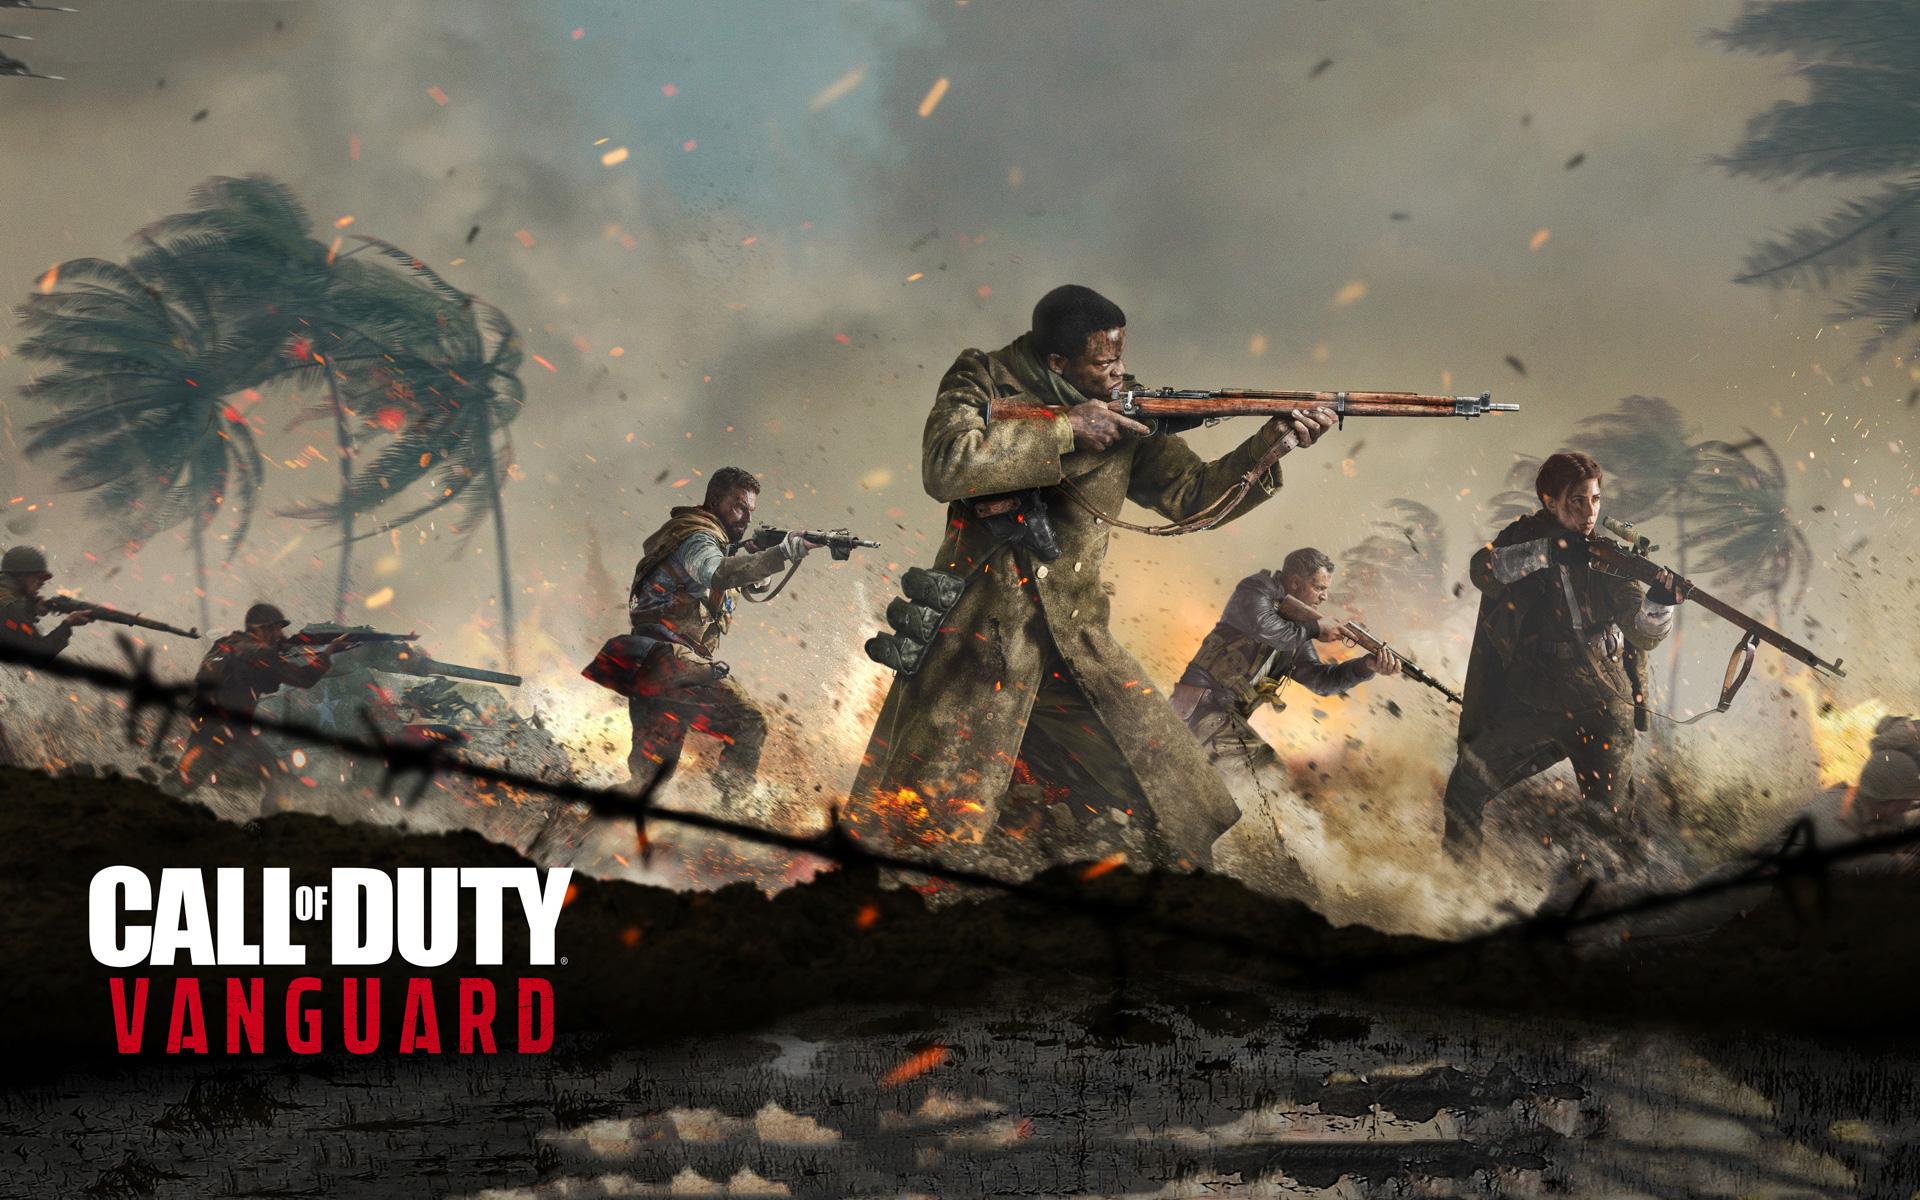 Free Call of Duty: Vanguard Wallpaper in 1920x1200